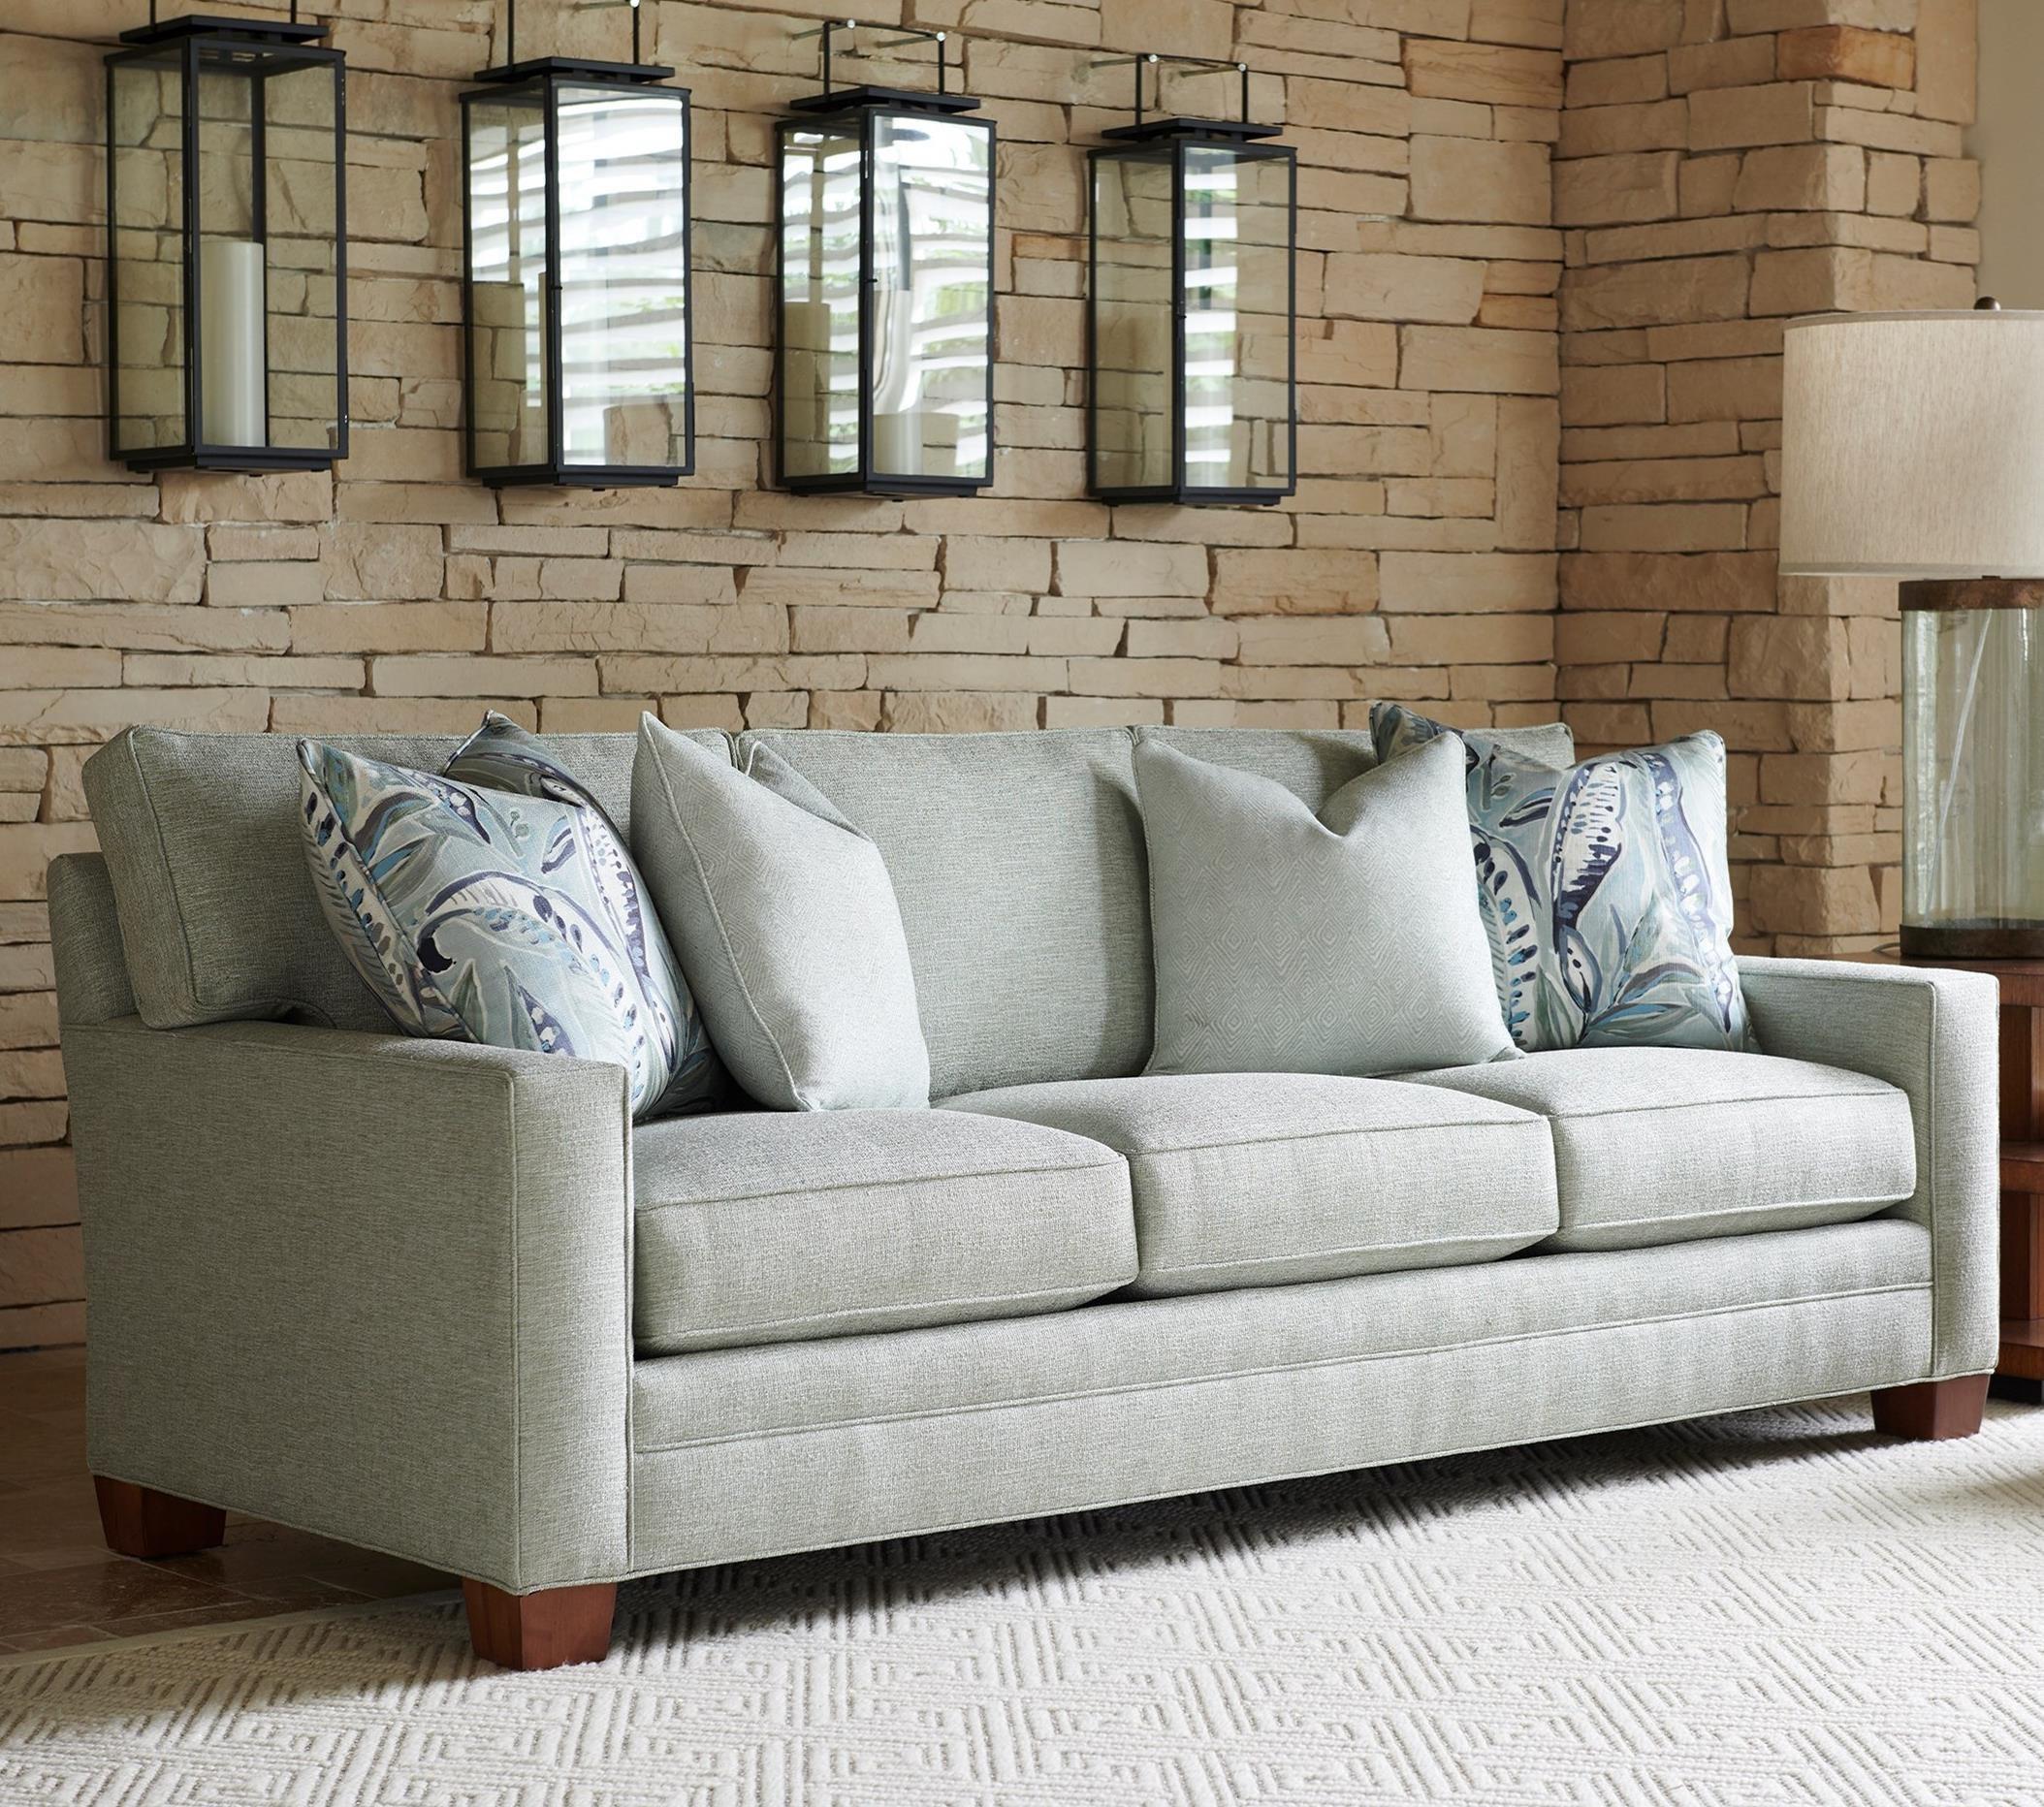 Personal Design Series Bedford Customizable 3- Cushion Sofa by Lexington at Johnny Janosik